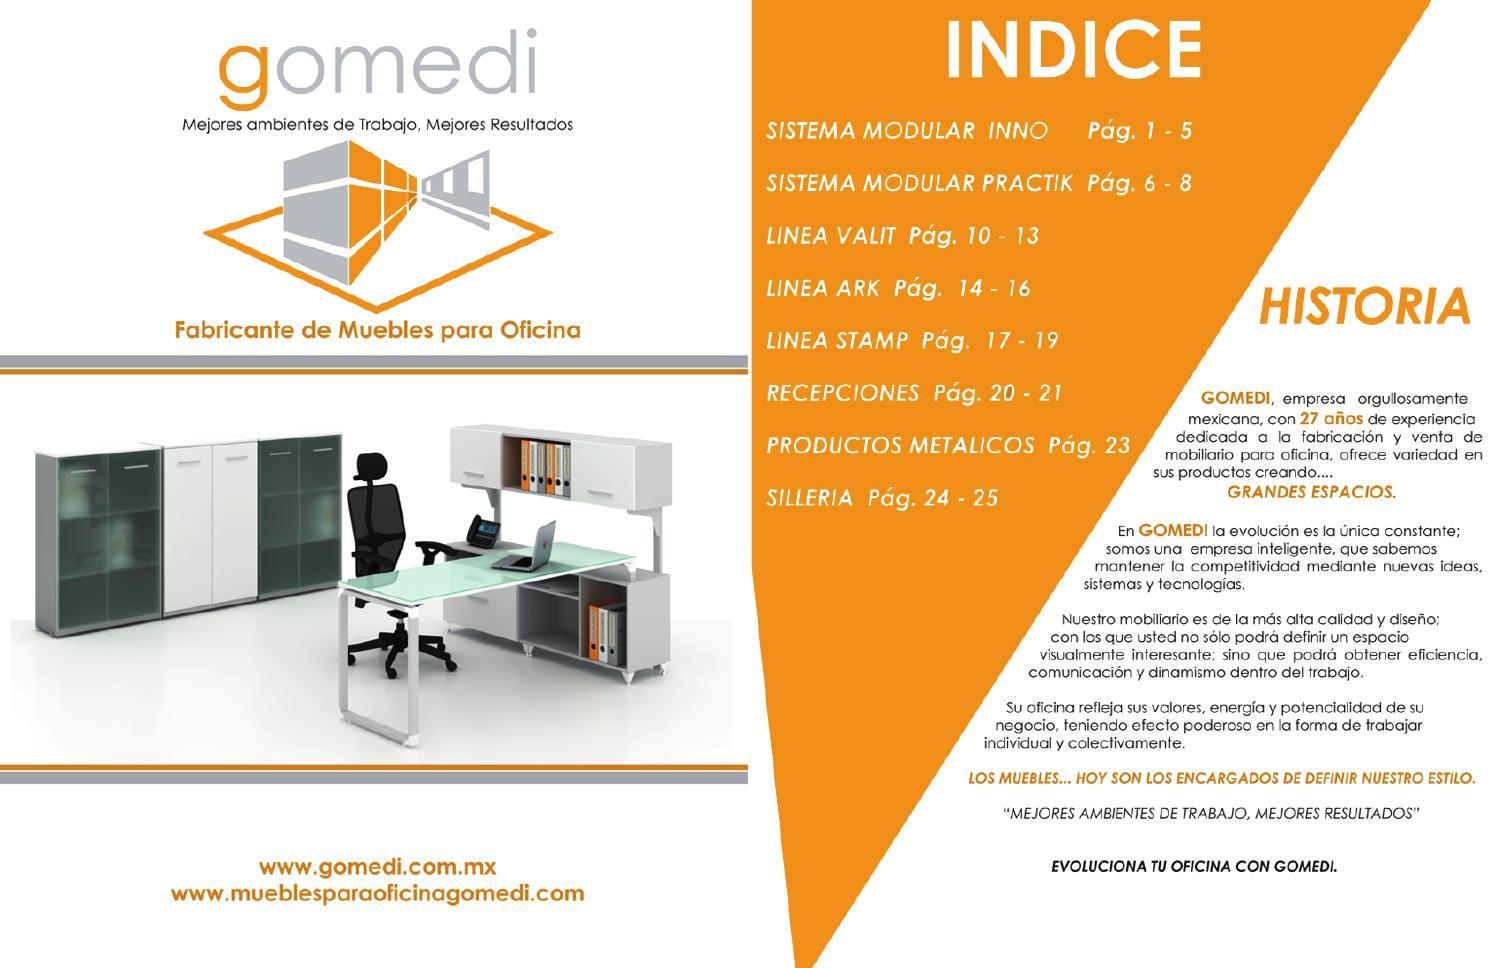 Cat logo digital muebles para oficina gomedi by gomedi s a - Muebles de oficina catalogo ...